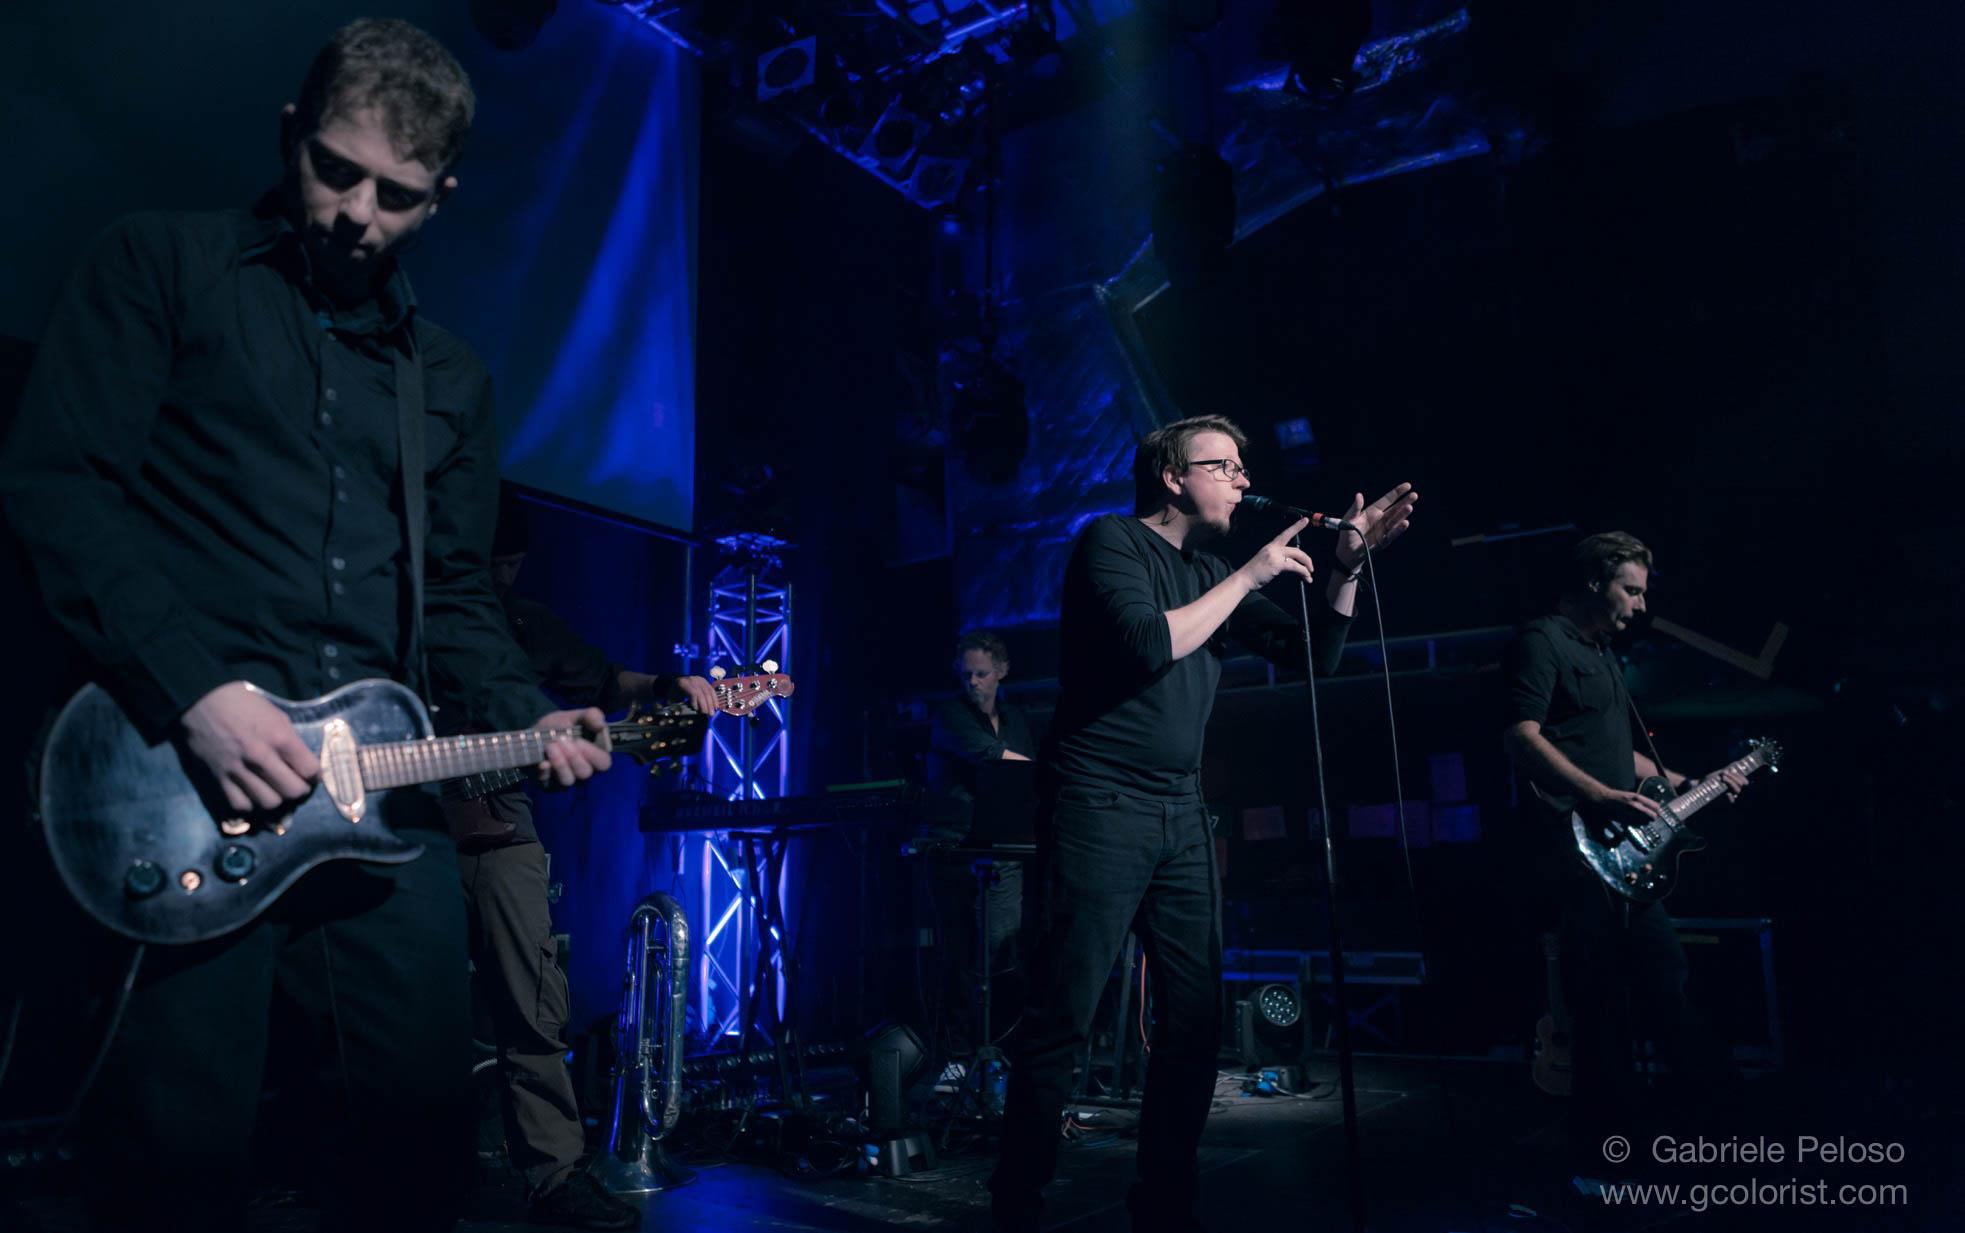 Live Review: Gazpacho at the O2 Academy Islington – November 2015